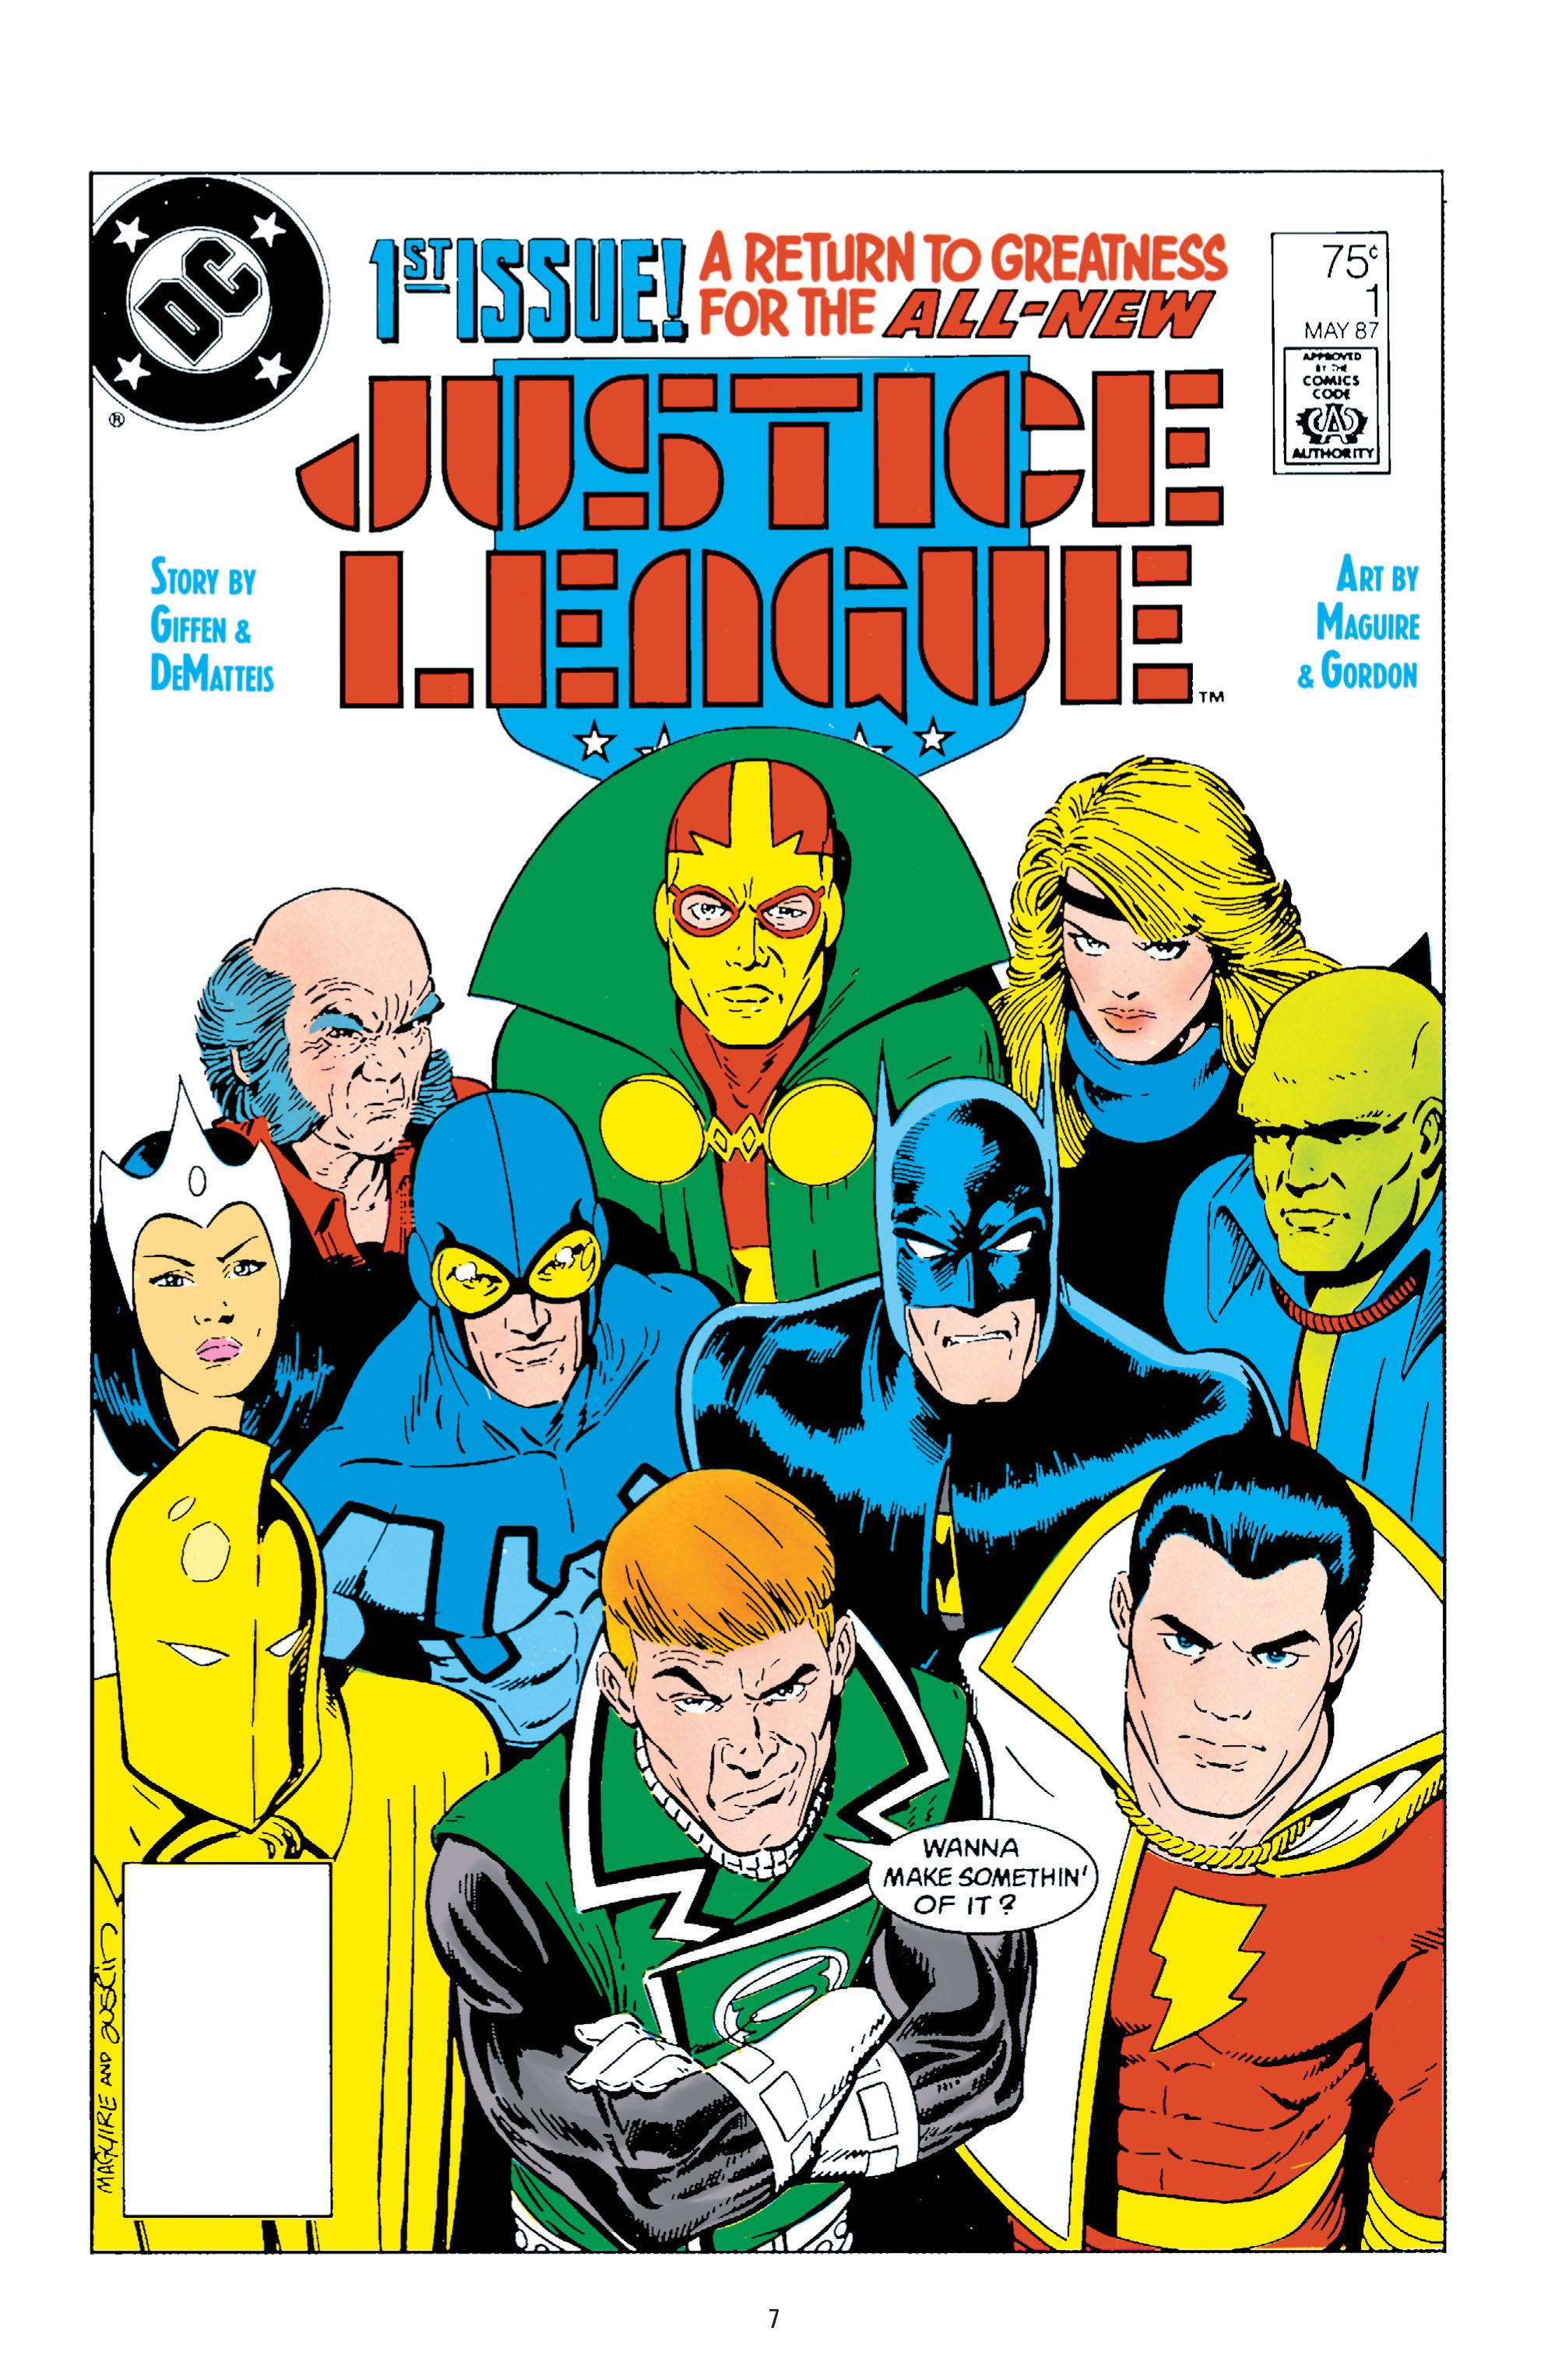 Justice League (Giffen/DeMatteis)